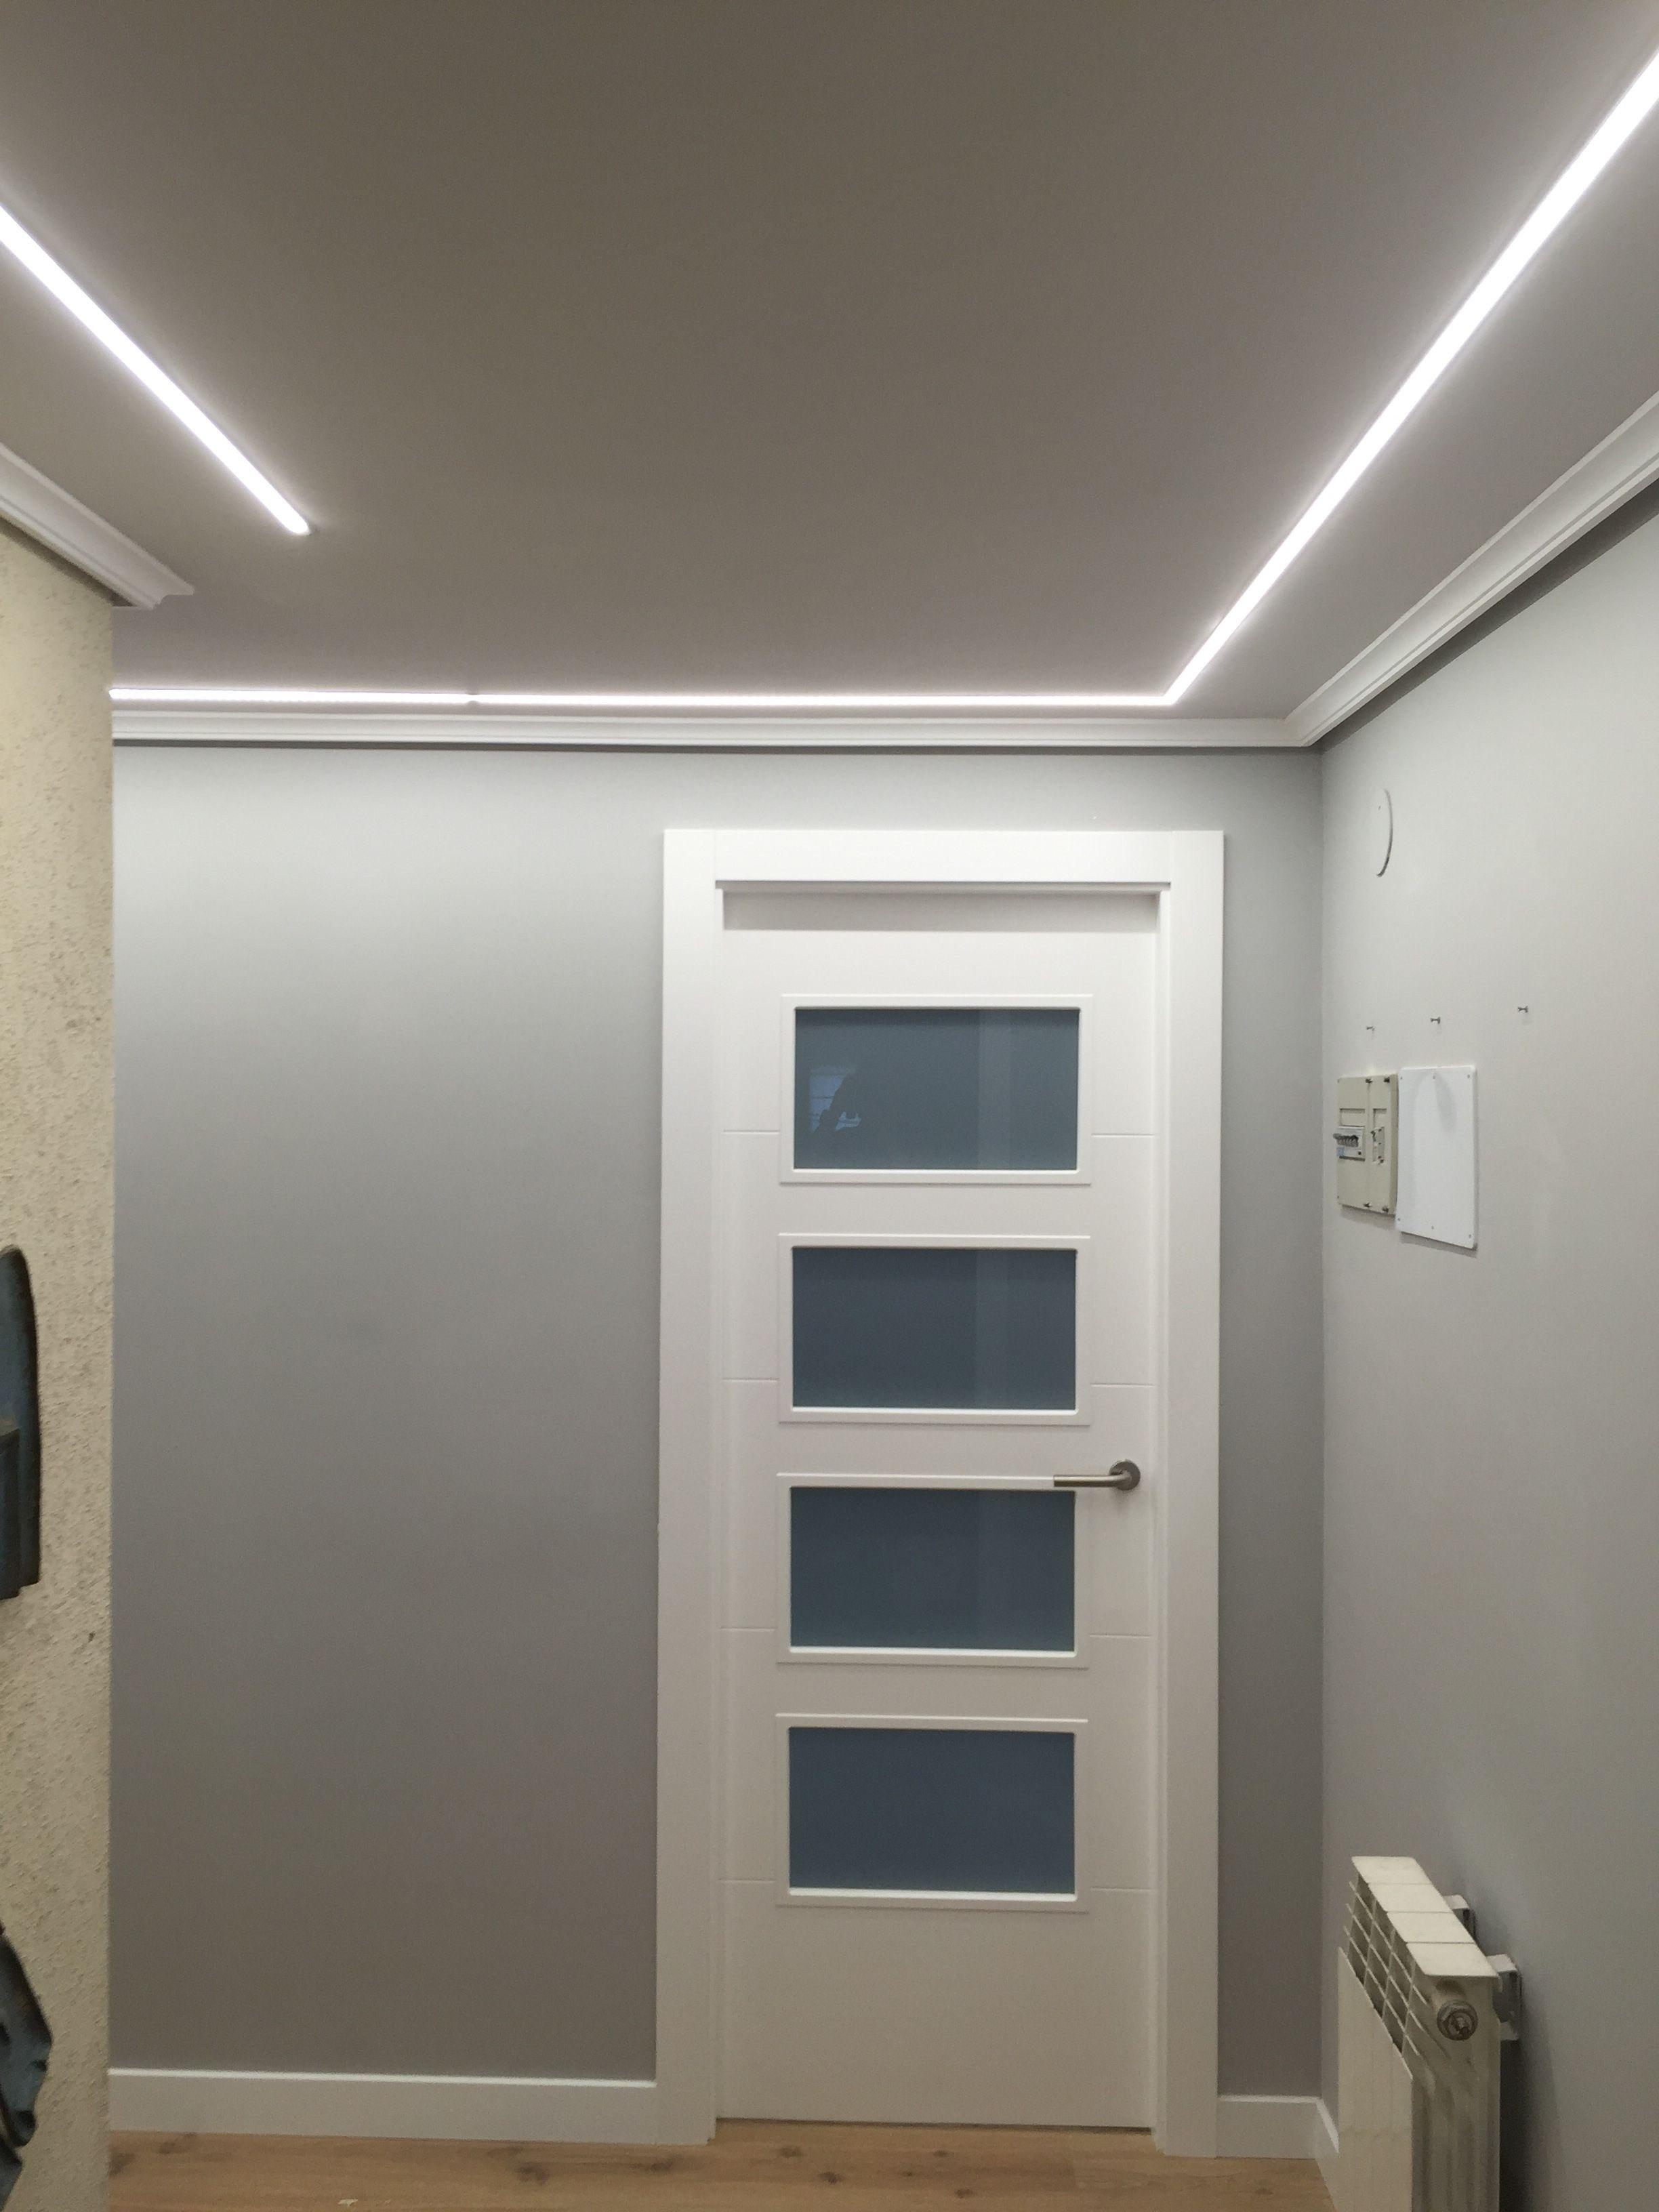 Hall iluminado con tiras de LEDs empotradas en el techo. | Pisos con ...